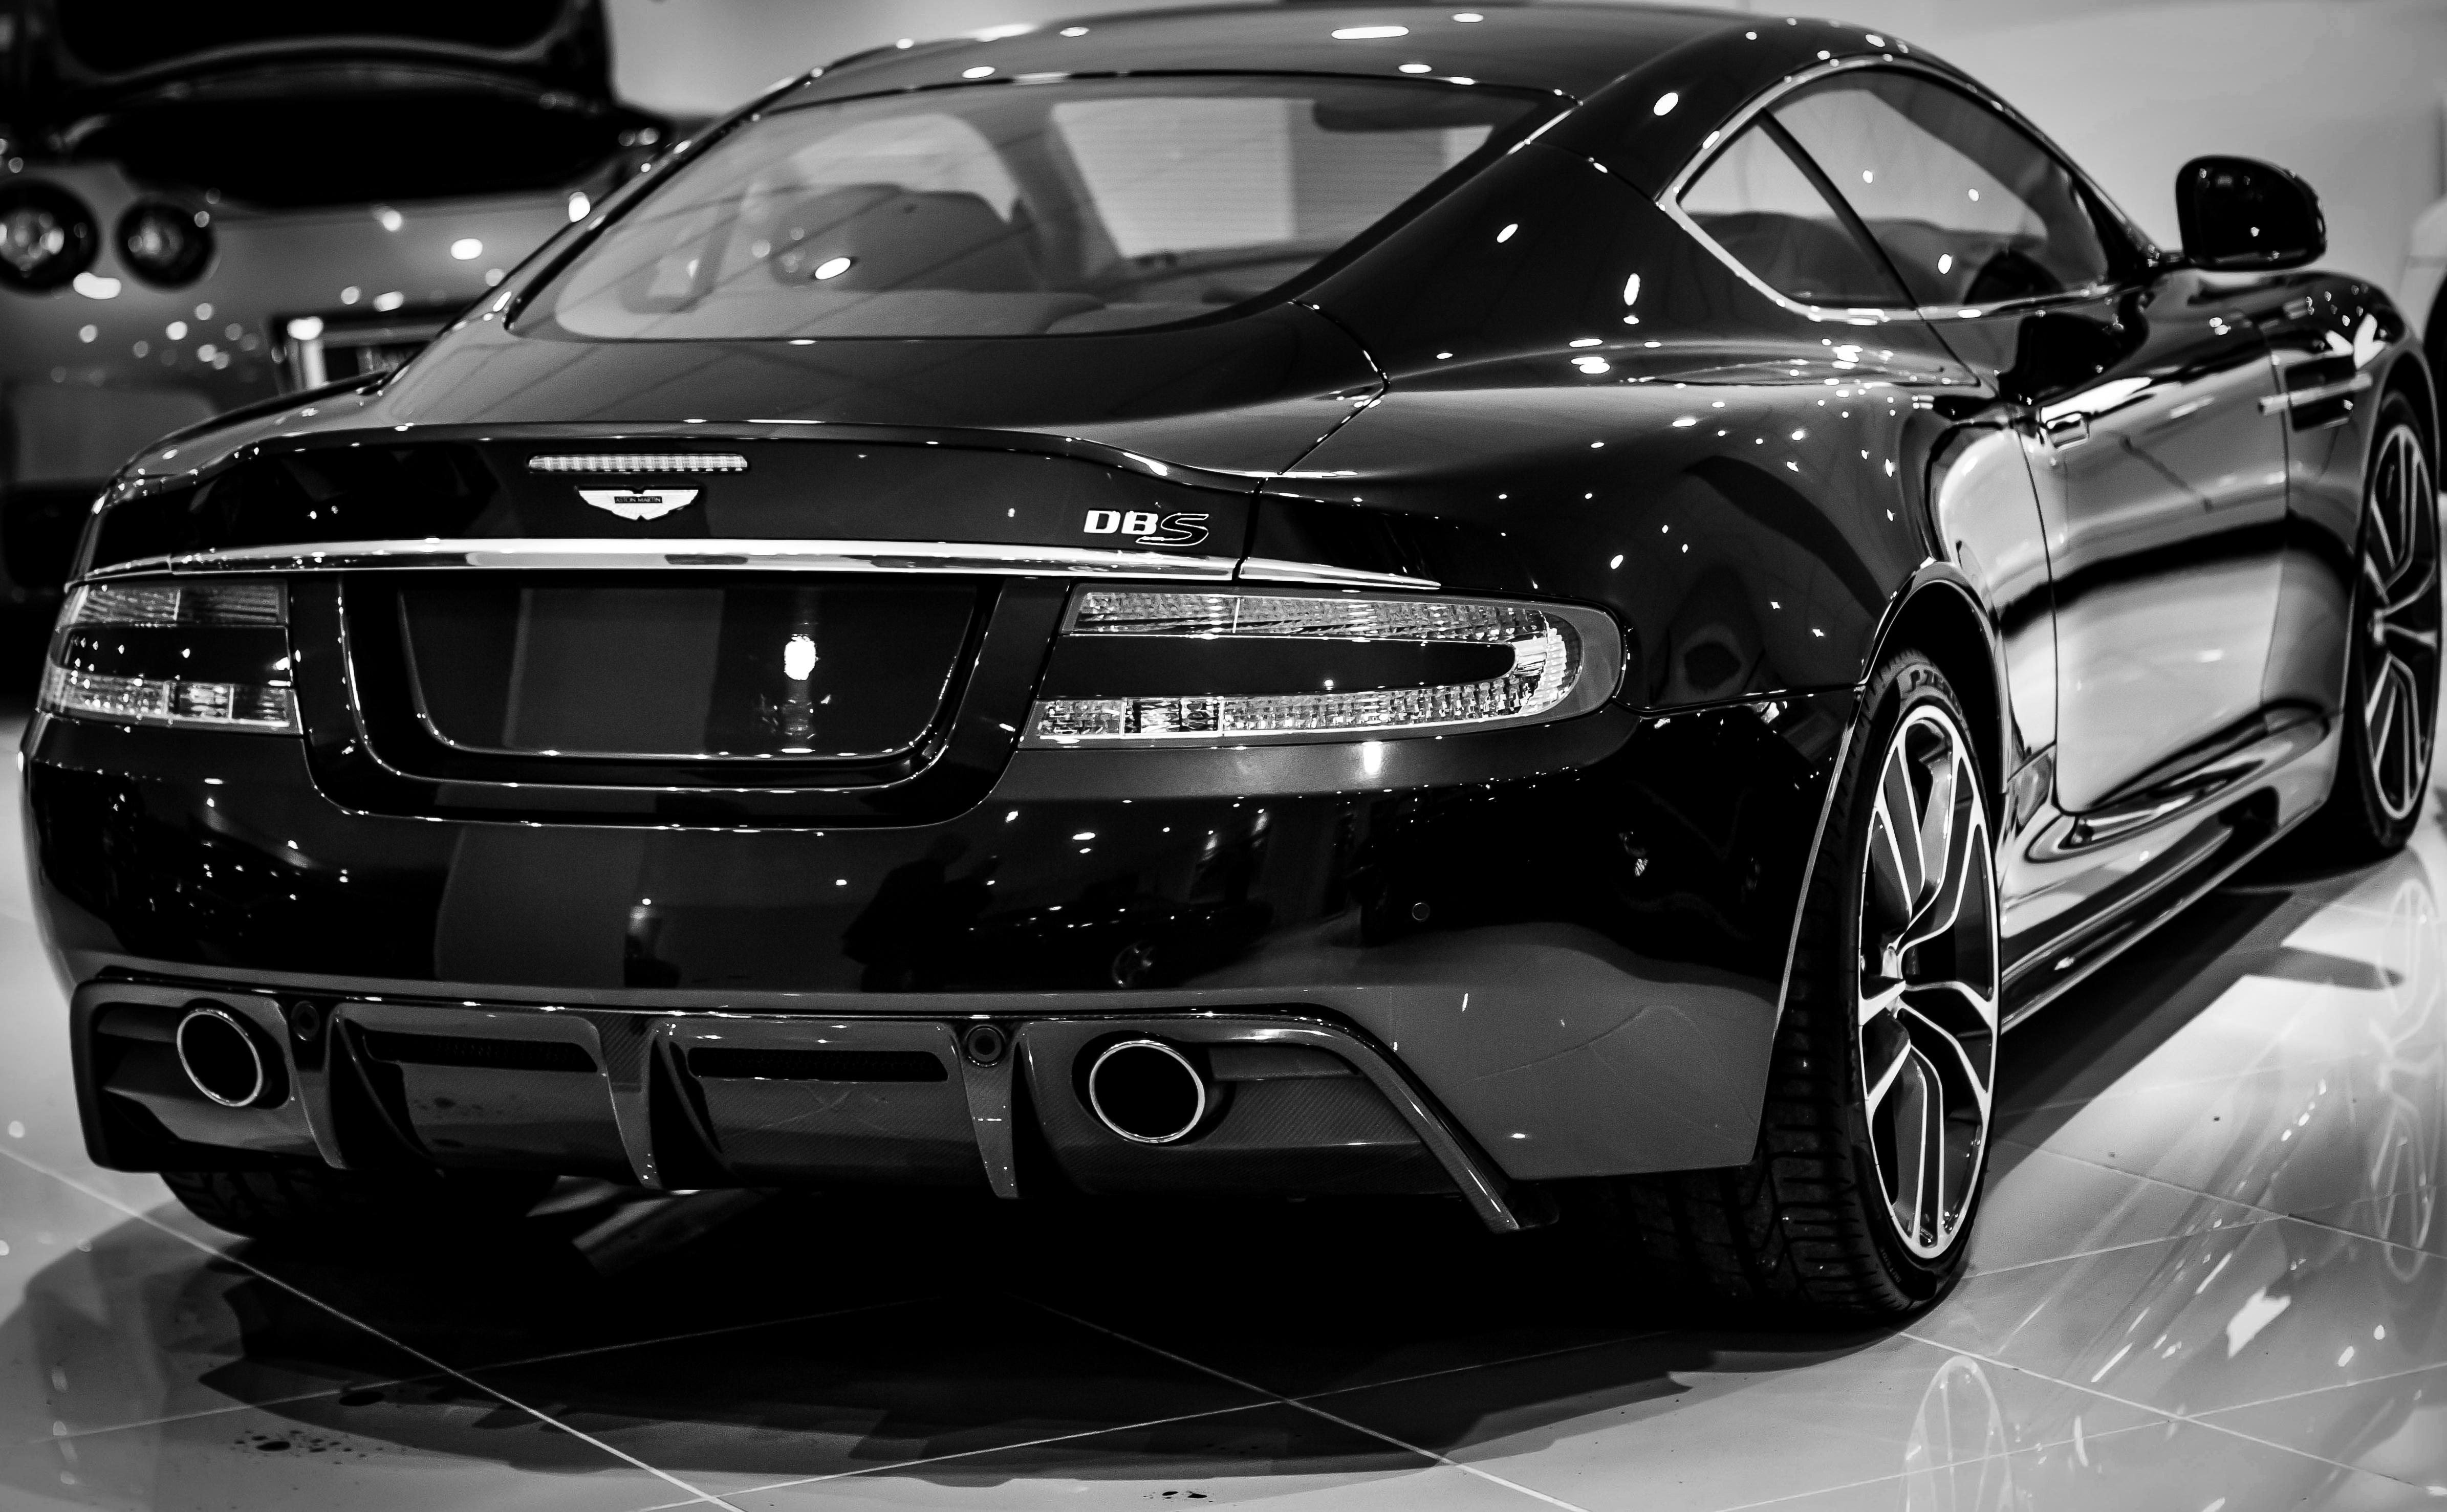 Aston Martin Car Black And White Free Image